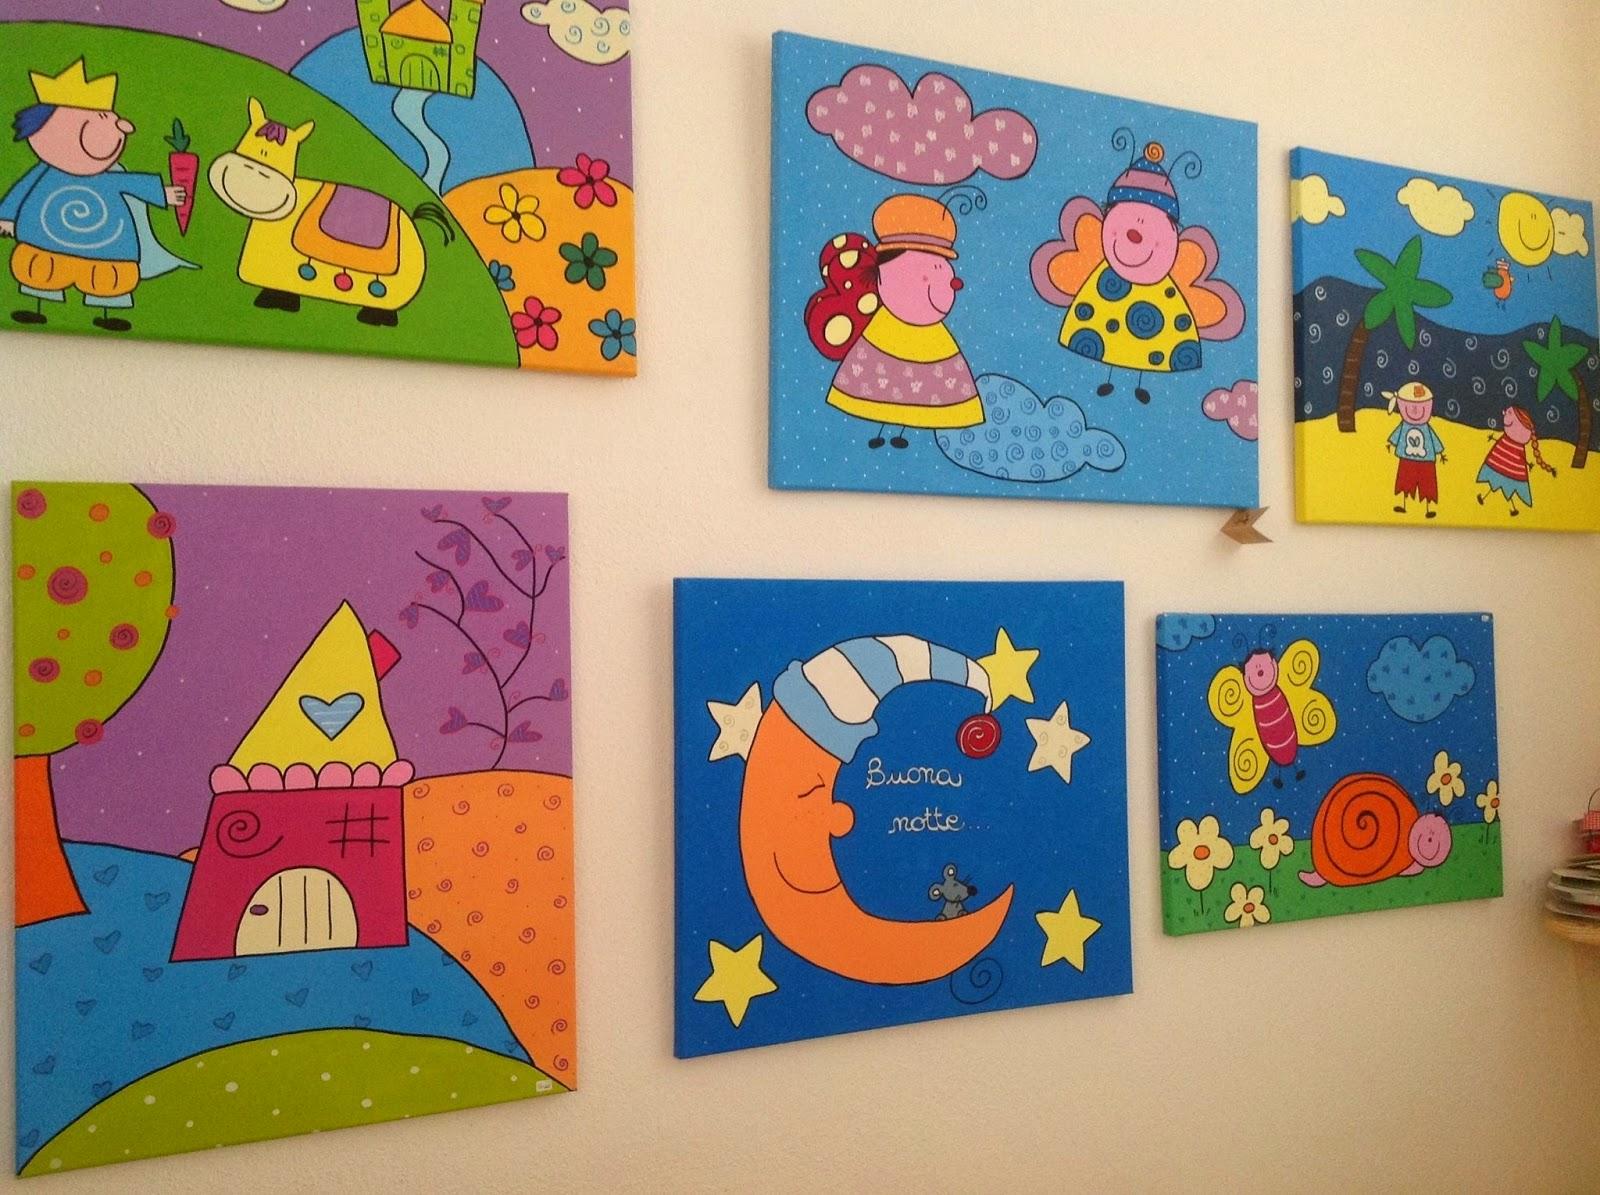 Disegni per camerette di bambini yl74 regardsdefemmes - Dipingere cameretta bambino ...